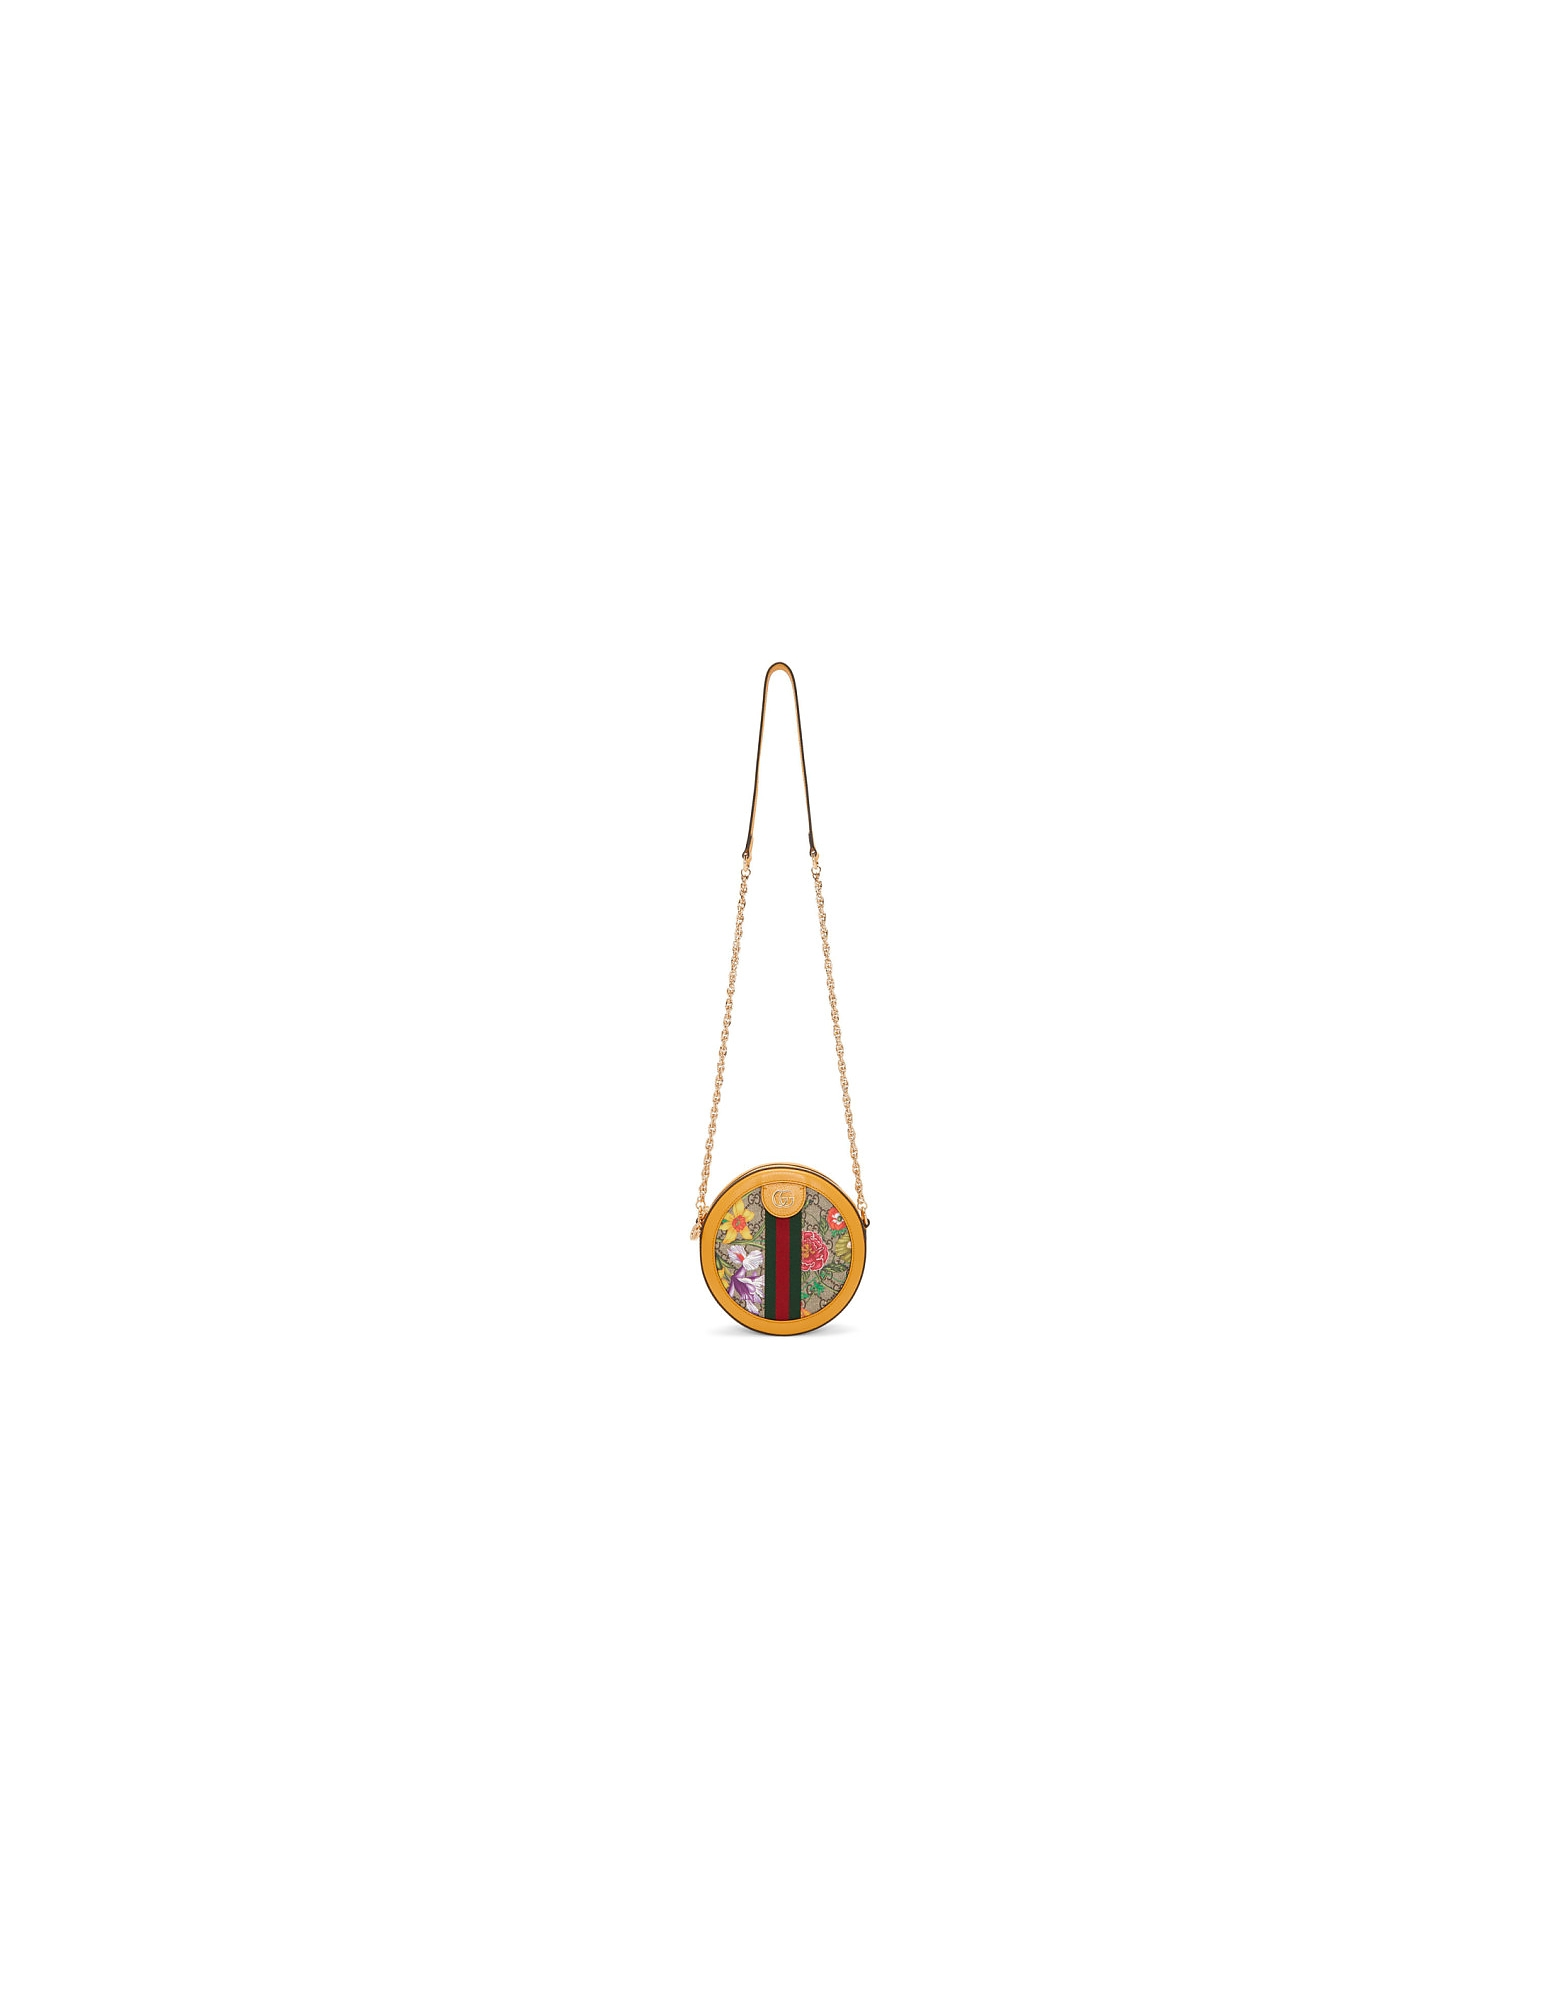 Gucci Designer Handbags, Yellow and Multicolor Mini Round Ophidia Bag